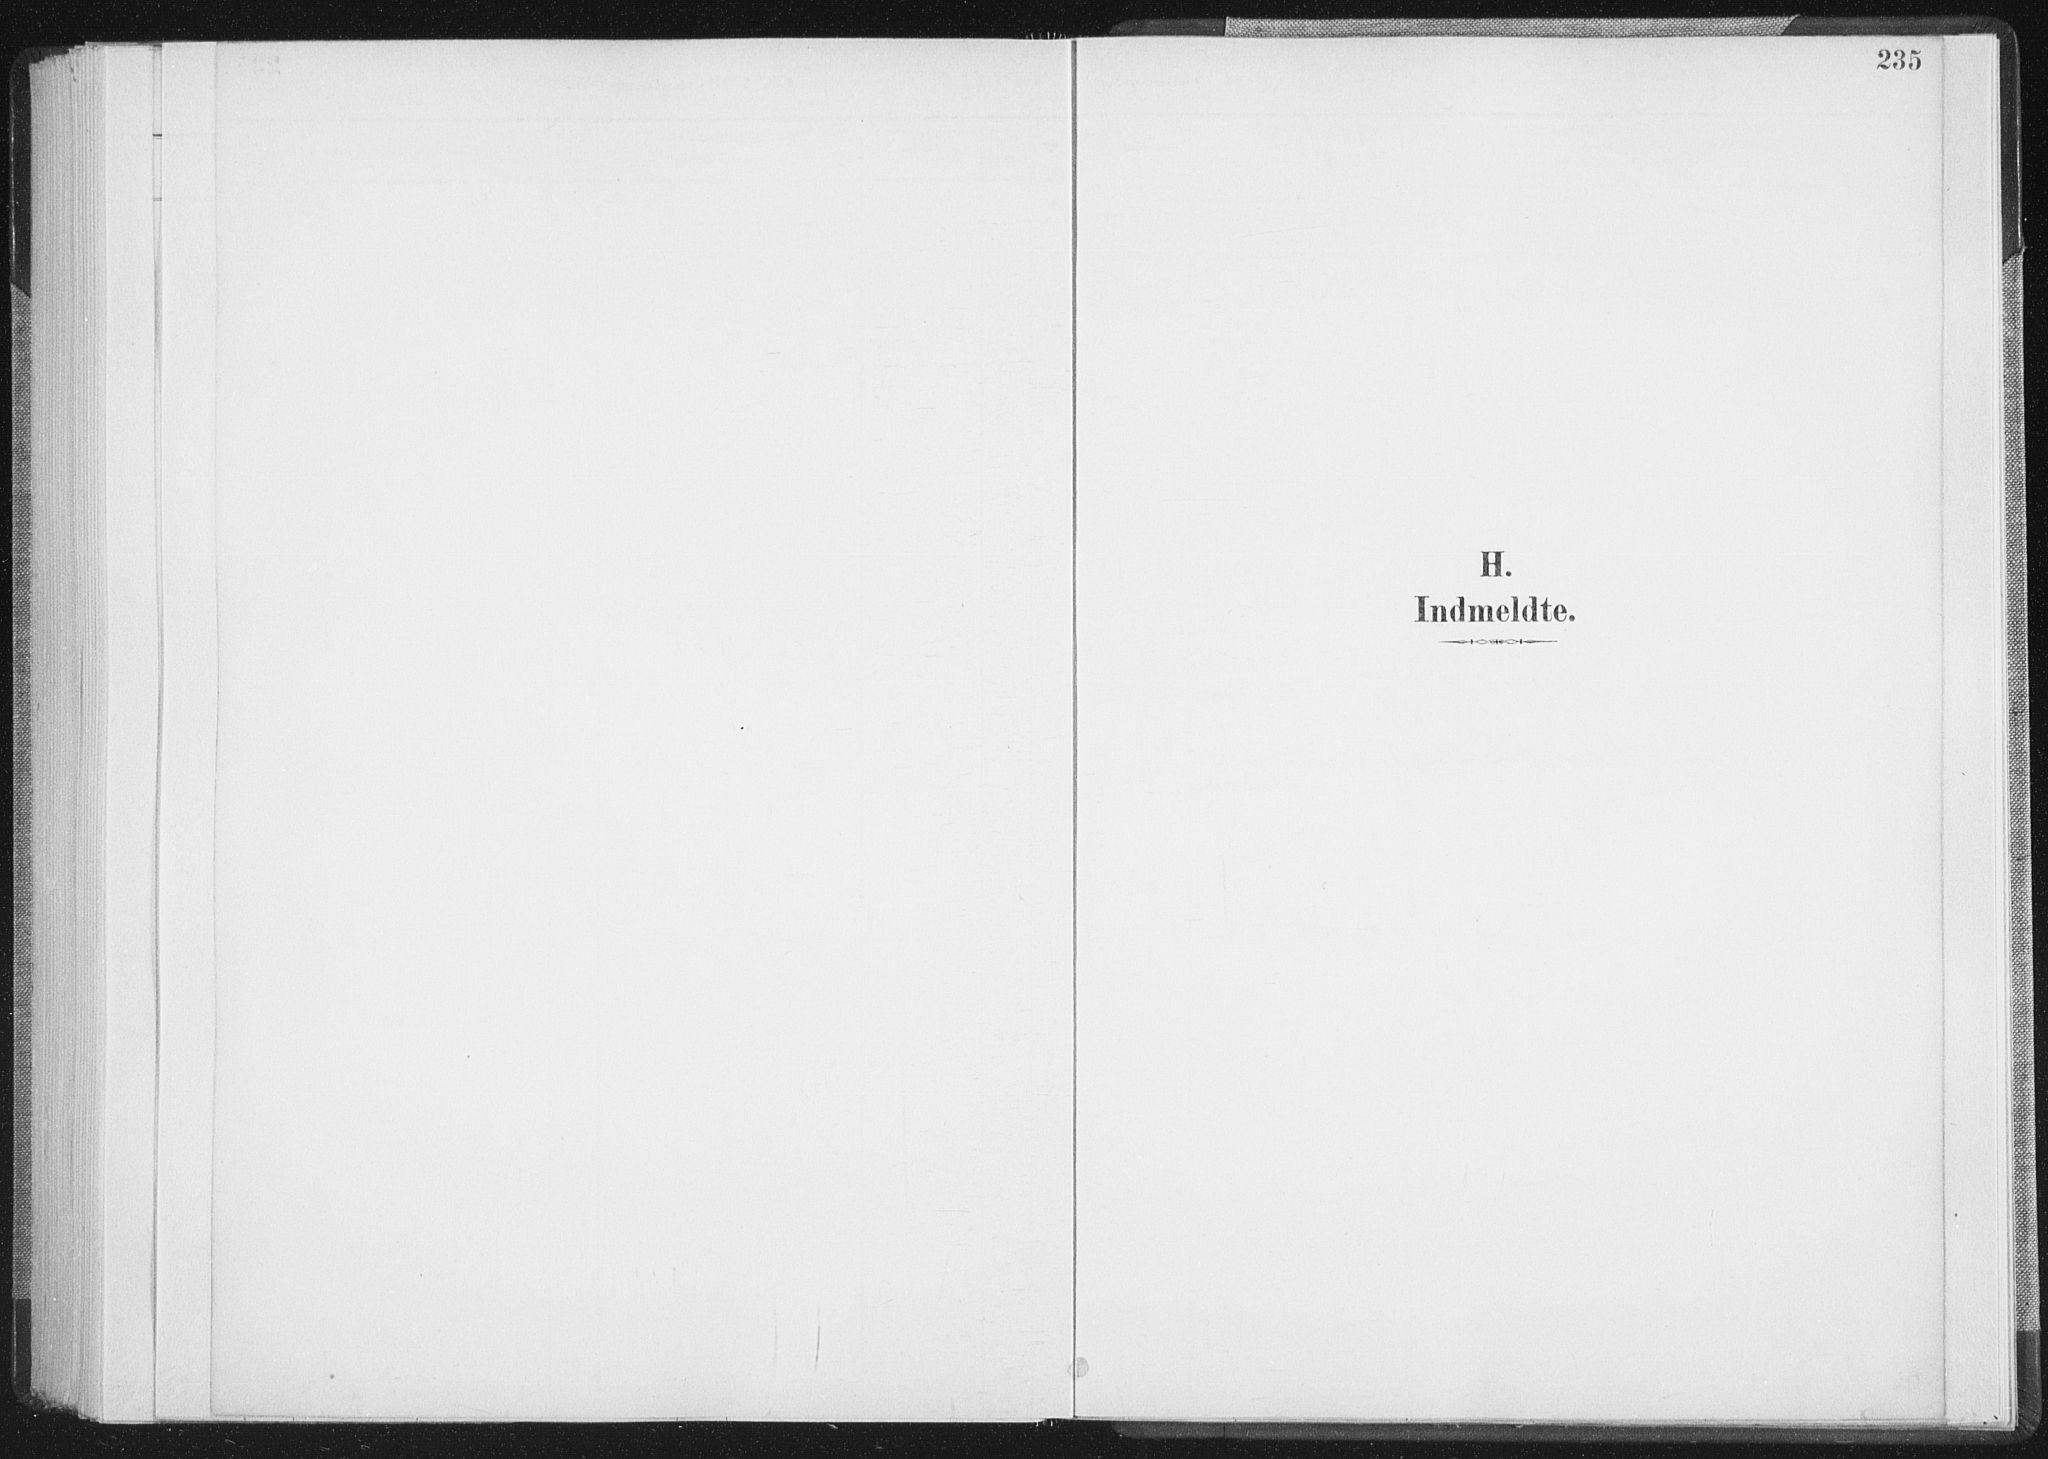 SAT, Ministerialprotokoller, klokkerbøker og fødselsregistre - Nordland, 898/L1422: Ministerialbok nr. 898A02, 1887-1908, s. 235